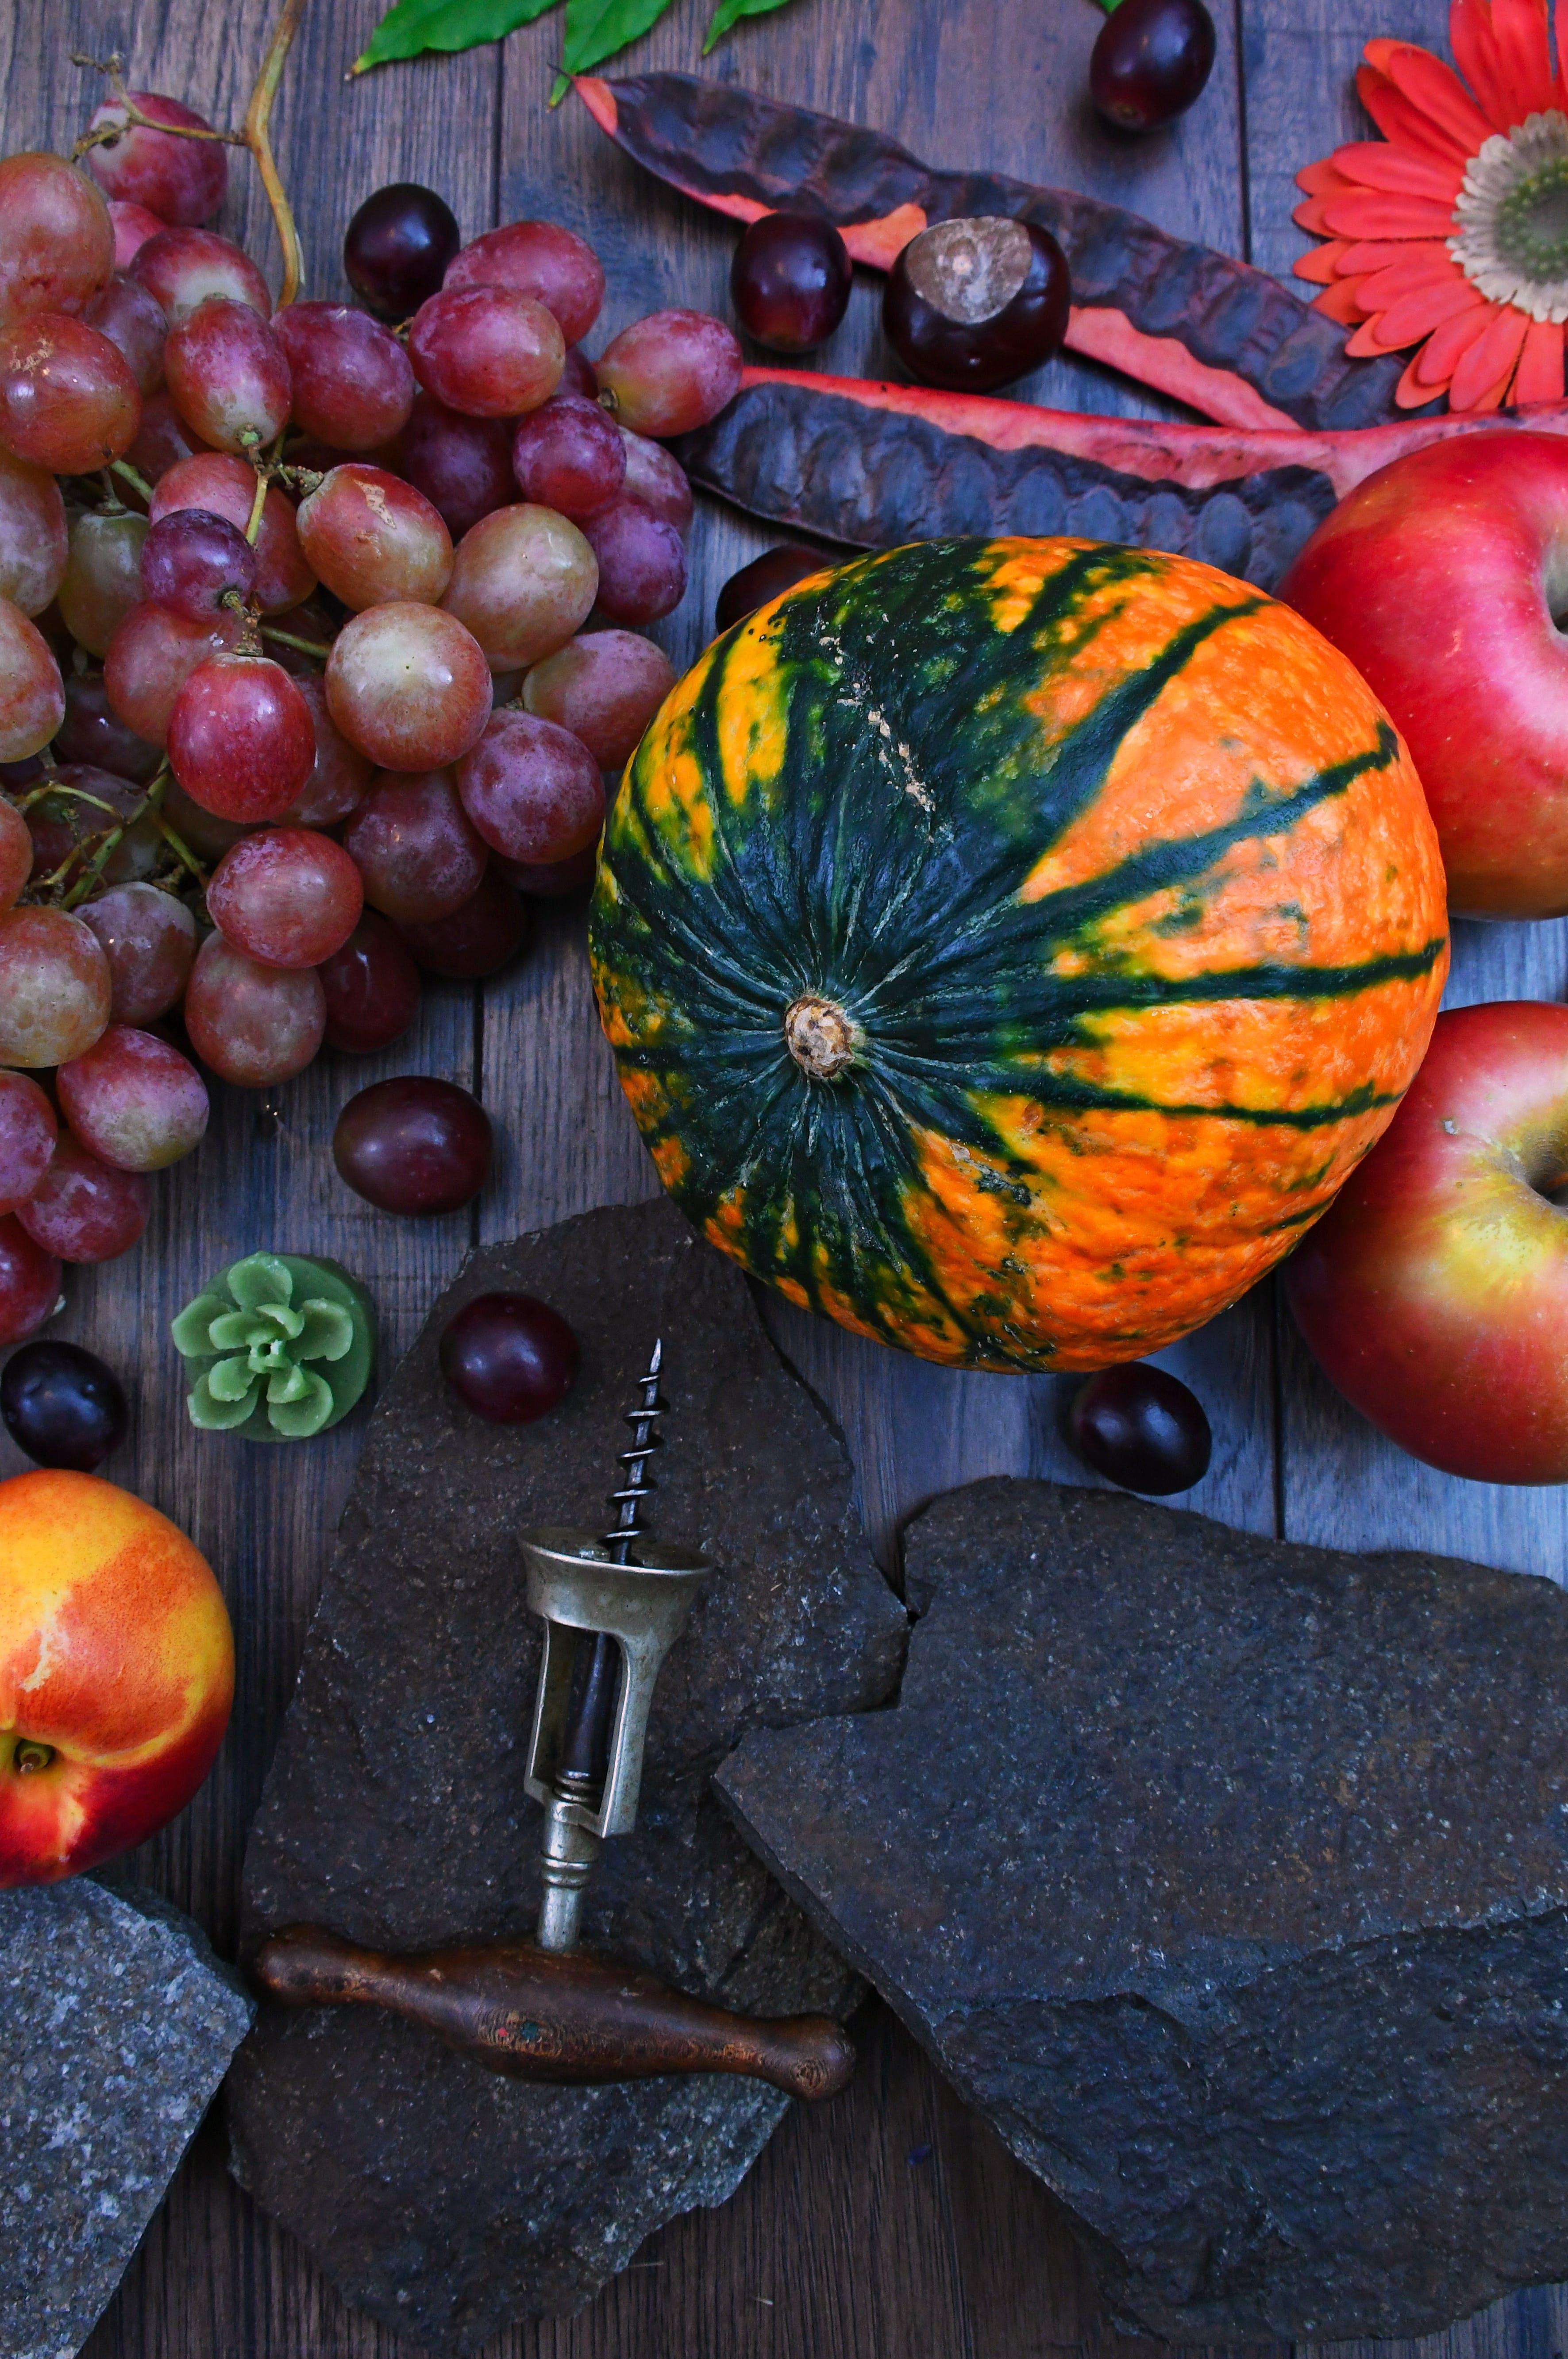 Orange Pumpkin Near Apples and Grapes